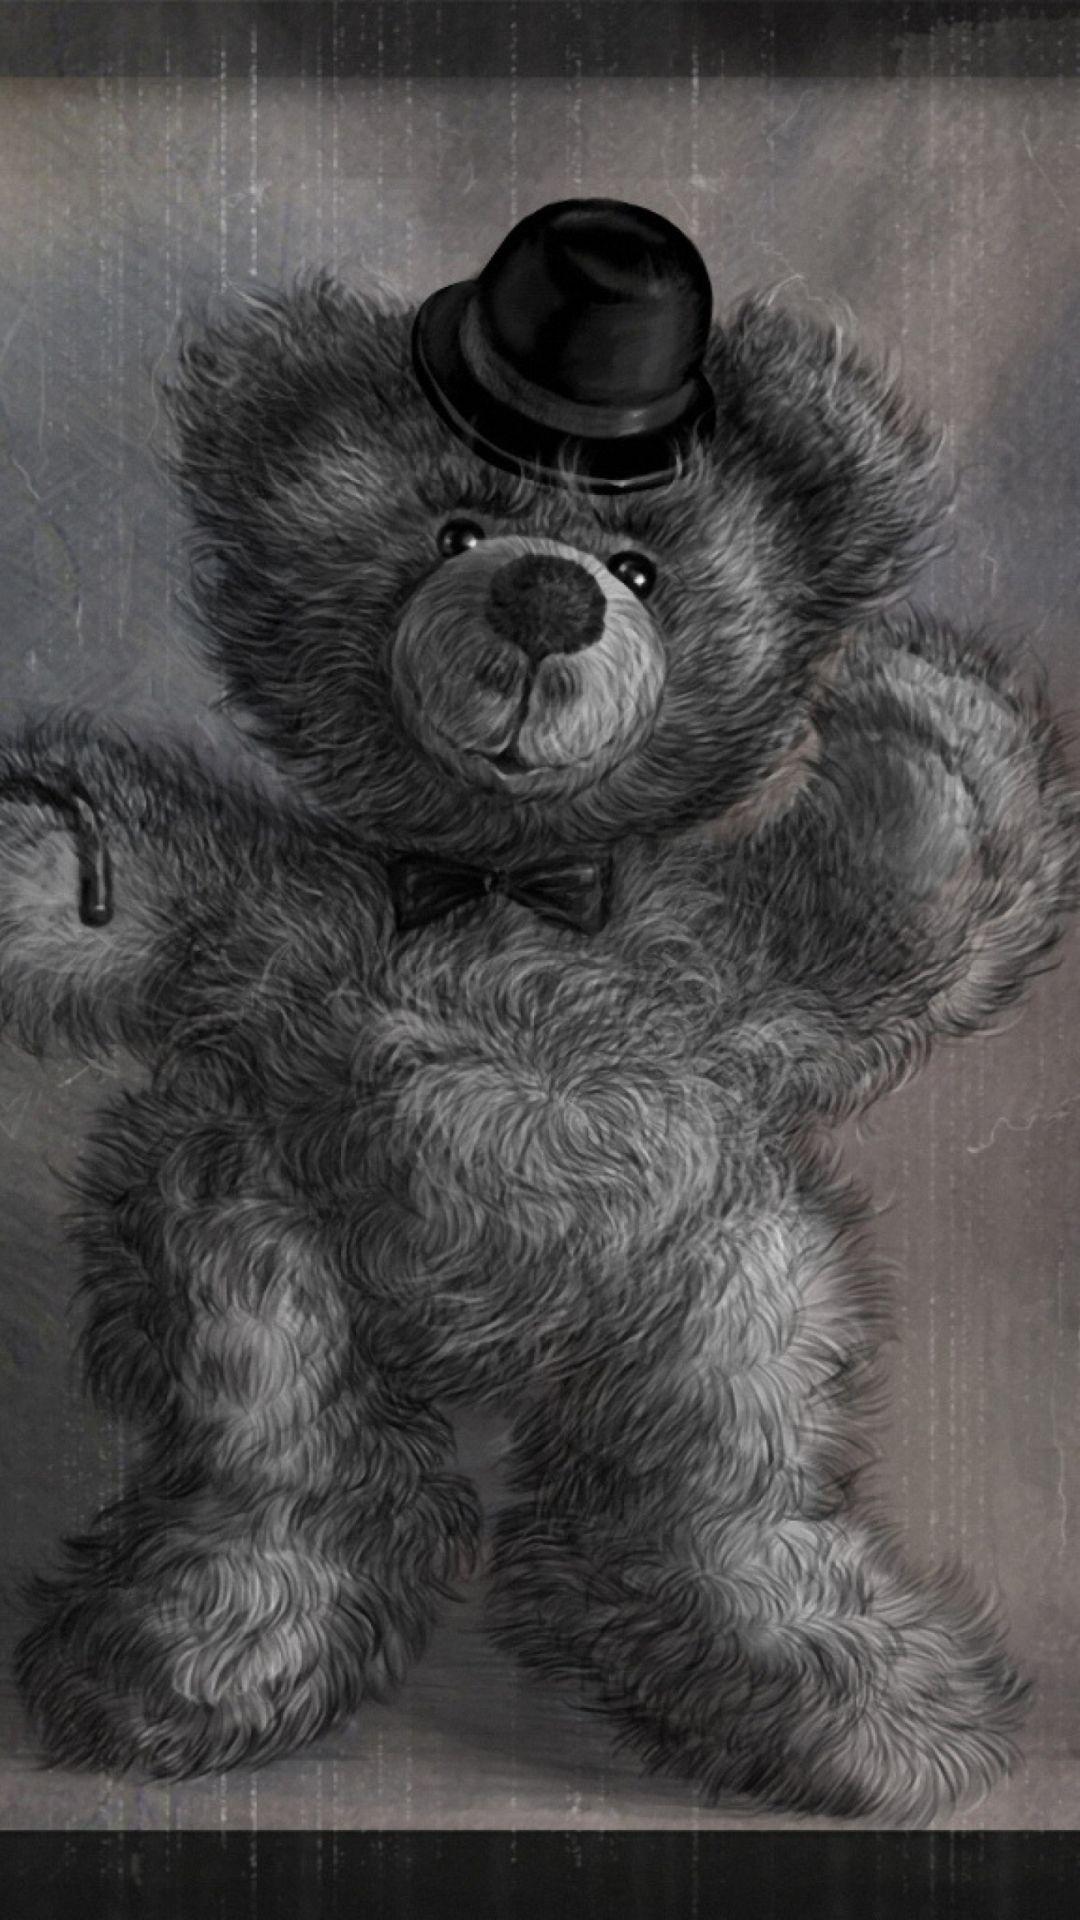 Teddy Bear Gentleman Wallpaper For Iphone Plus